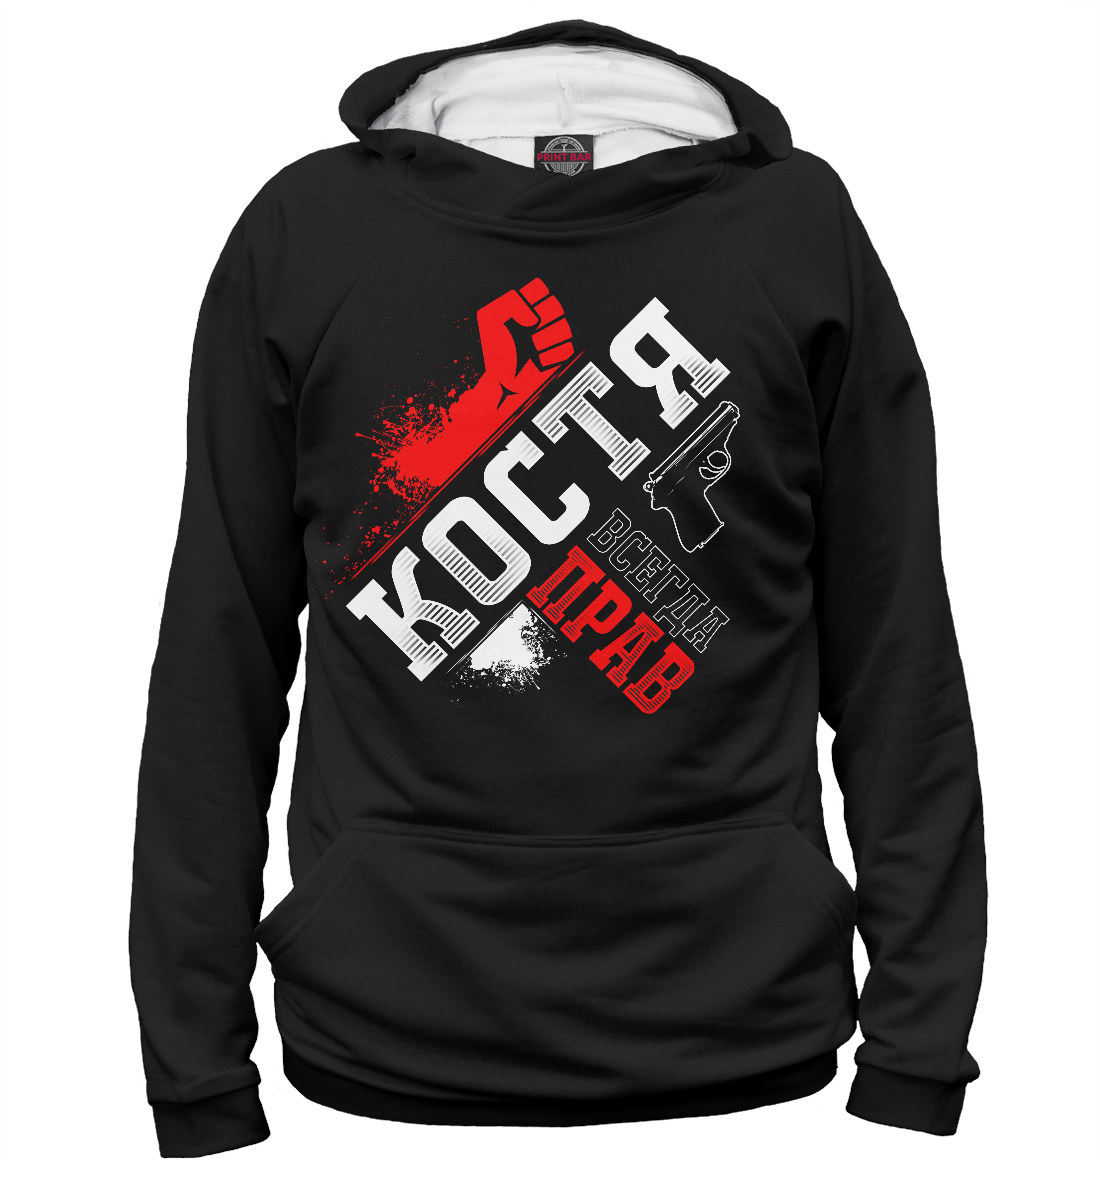 Купить Костя, Printbar, Худи, KST-995655-hud-1